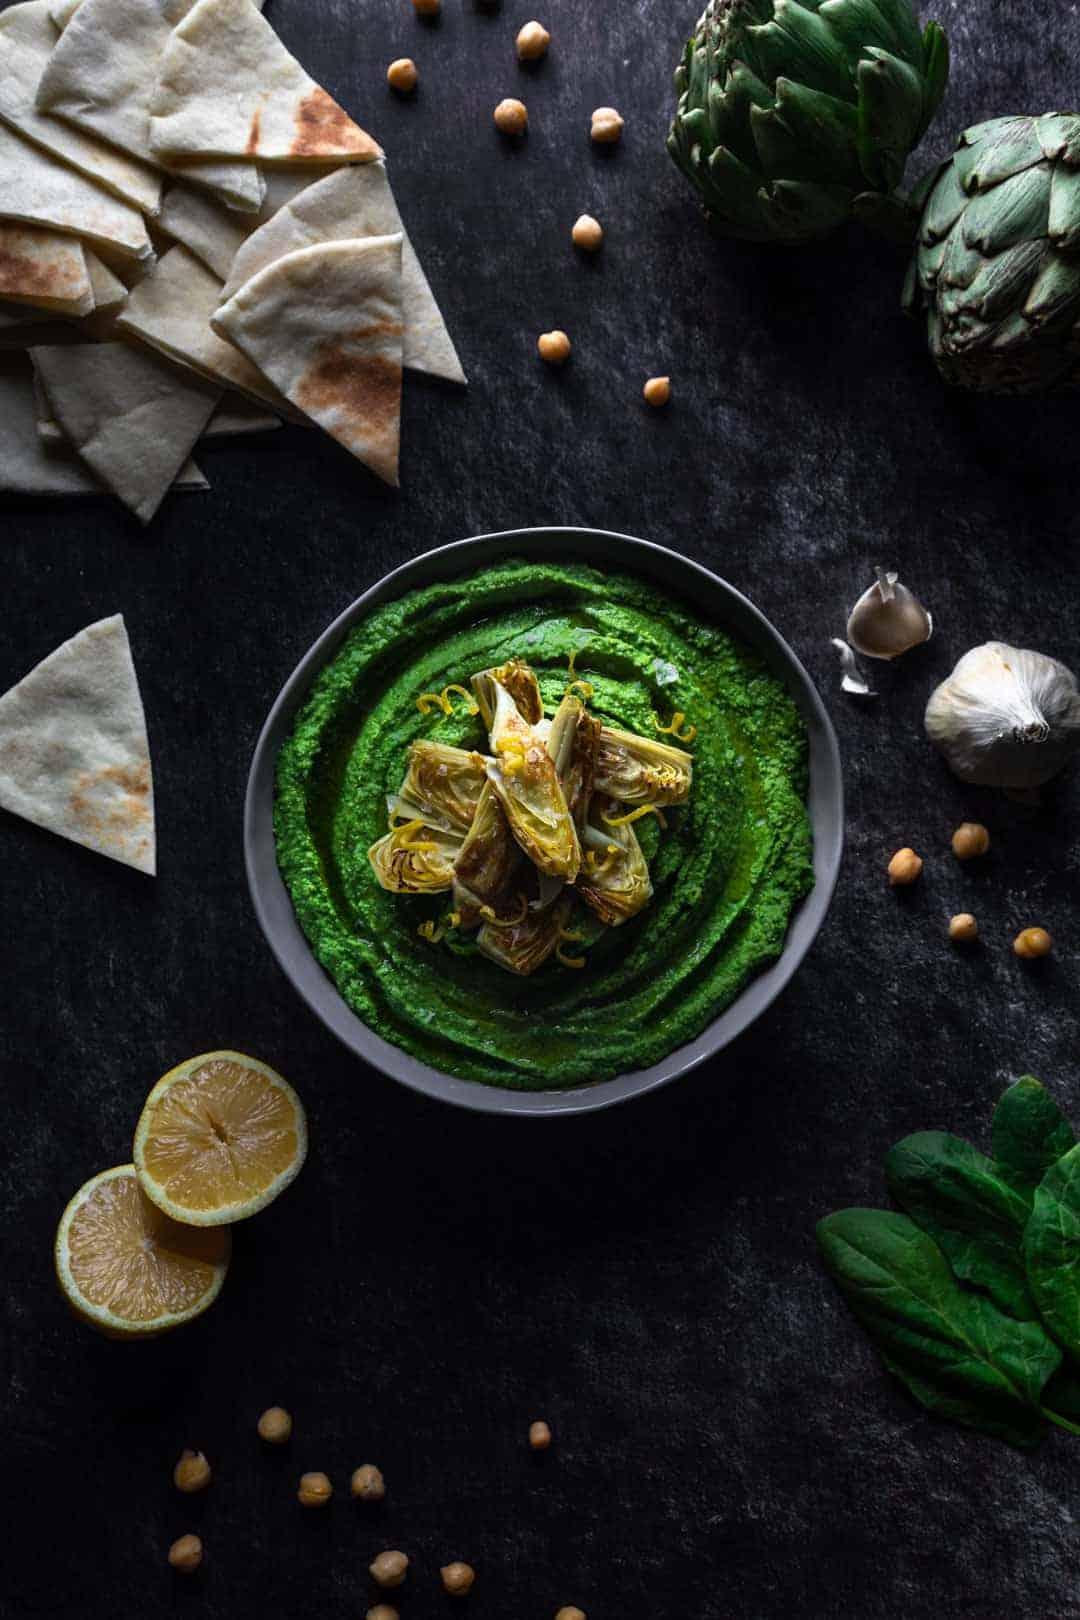 Spinach hummus scene with pita triangles, lemons and garlic